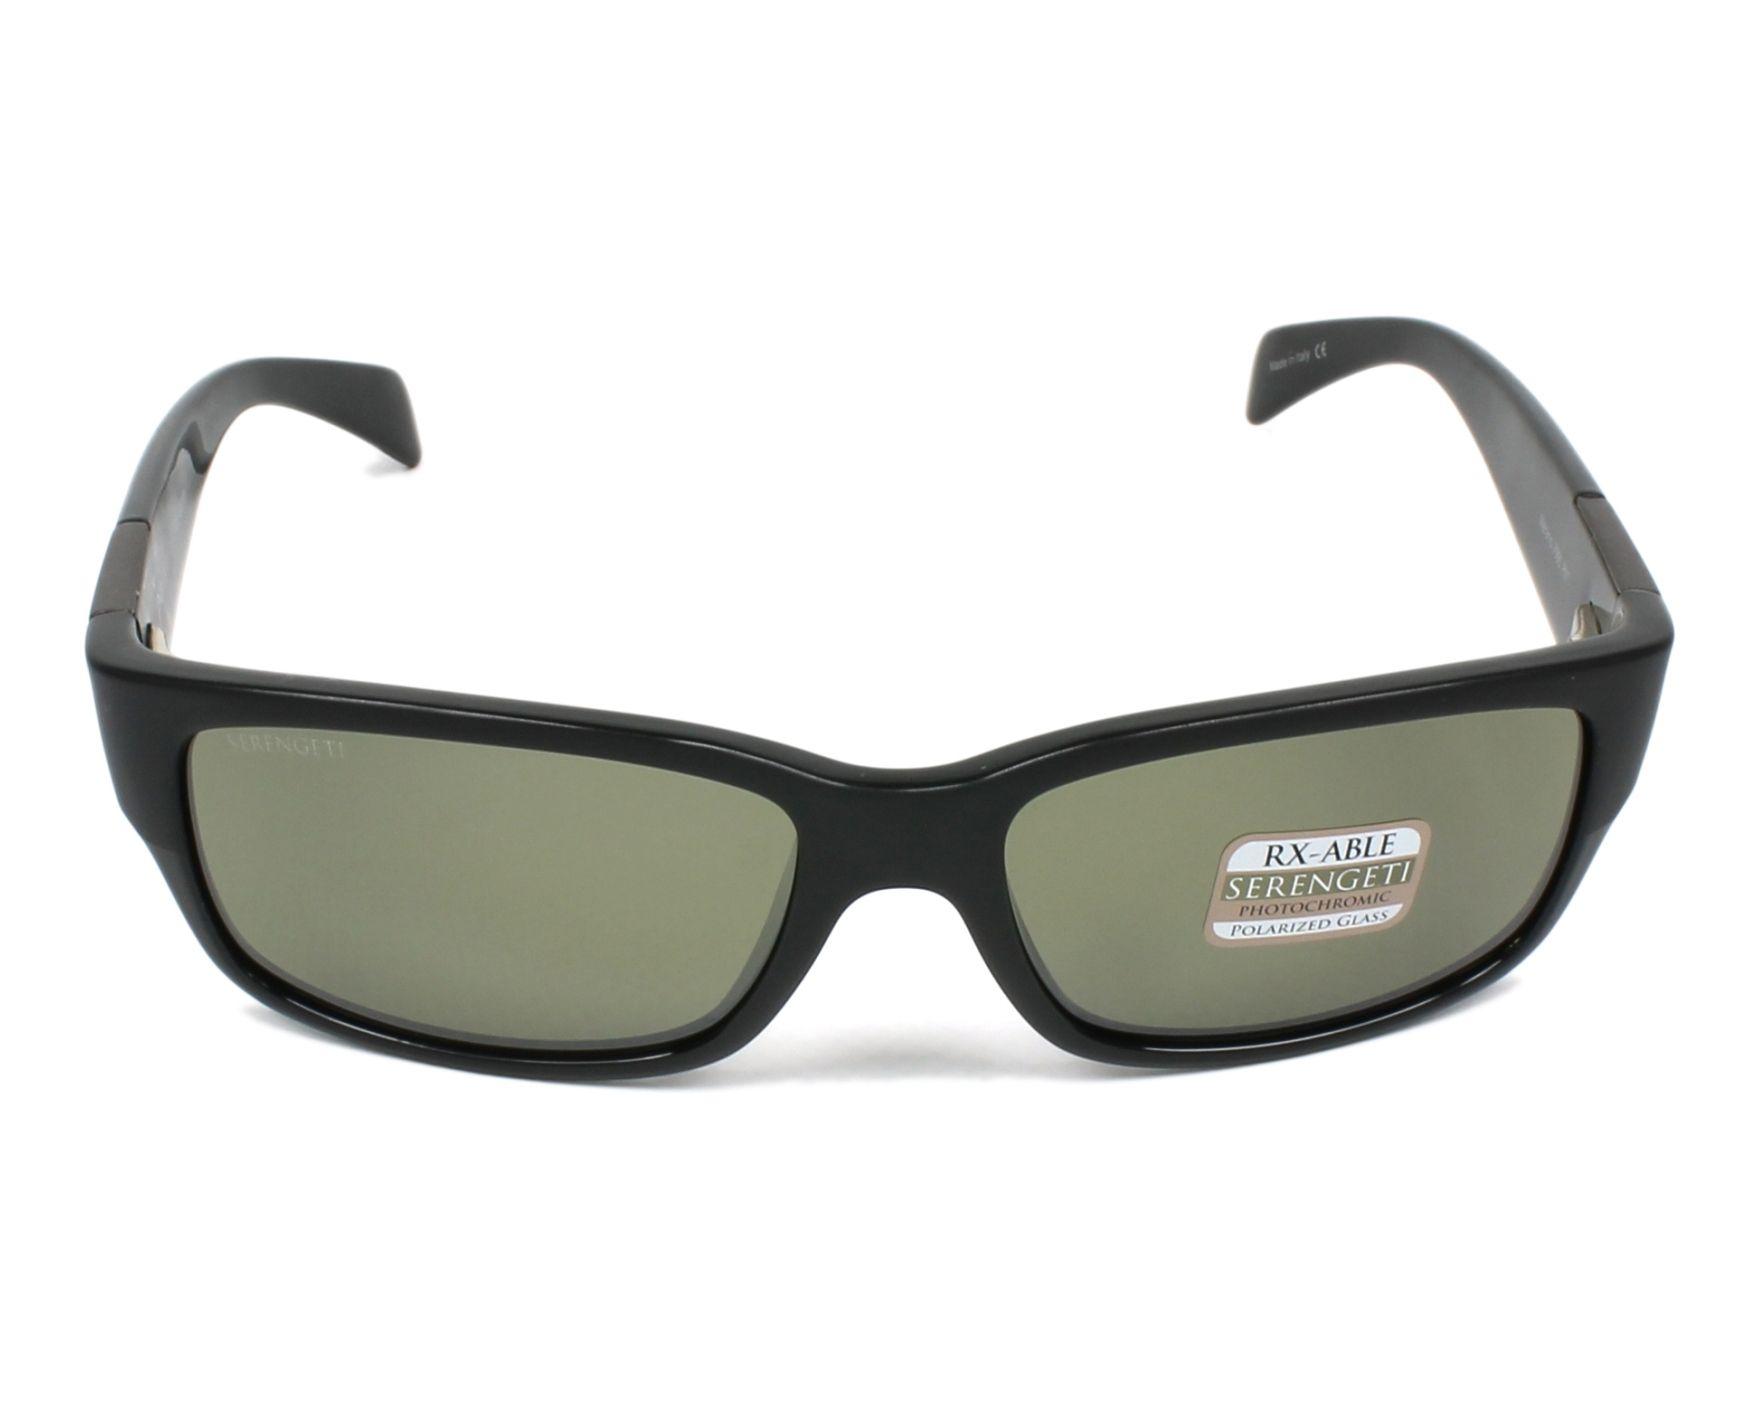 66e4ac6ad46 Where To Buy Serengeti Sunglasses St Augustine